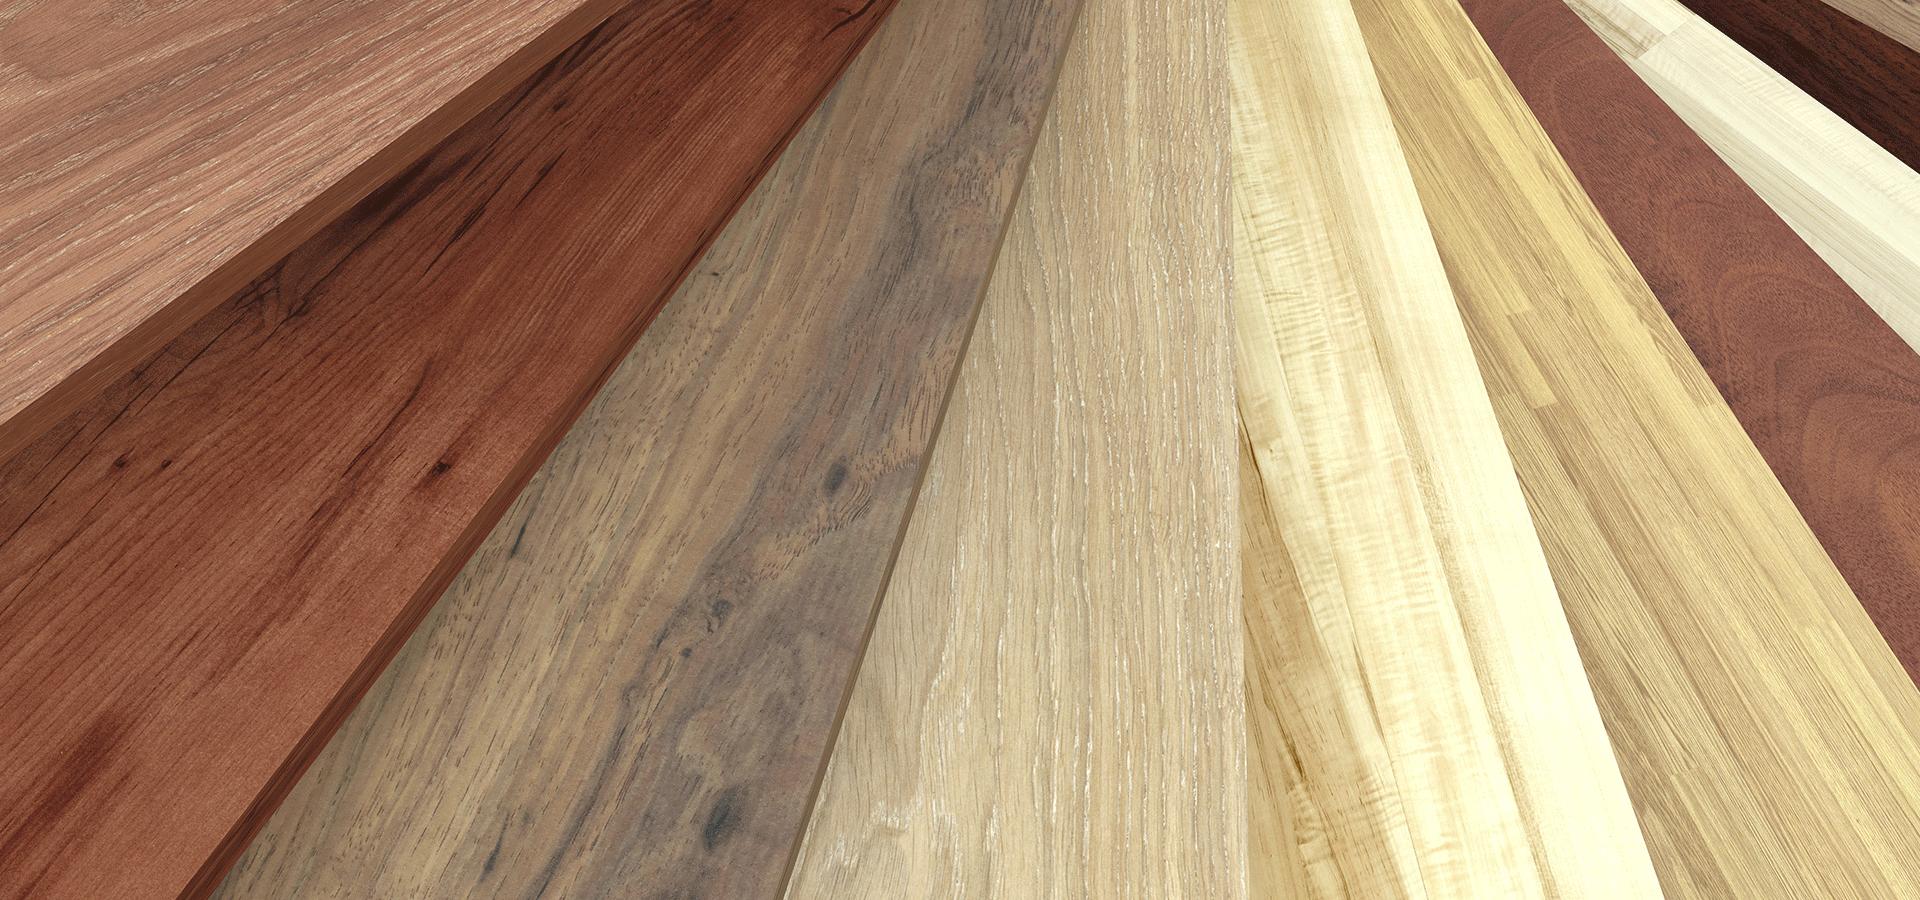 Laminate Flooring Installation S, Laminate Wood Flooring Tucson Az